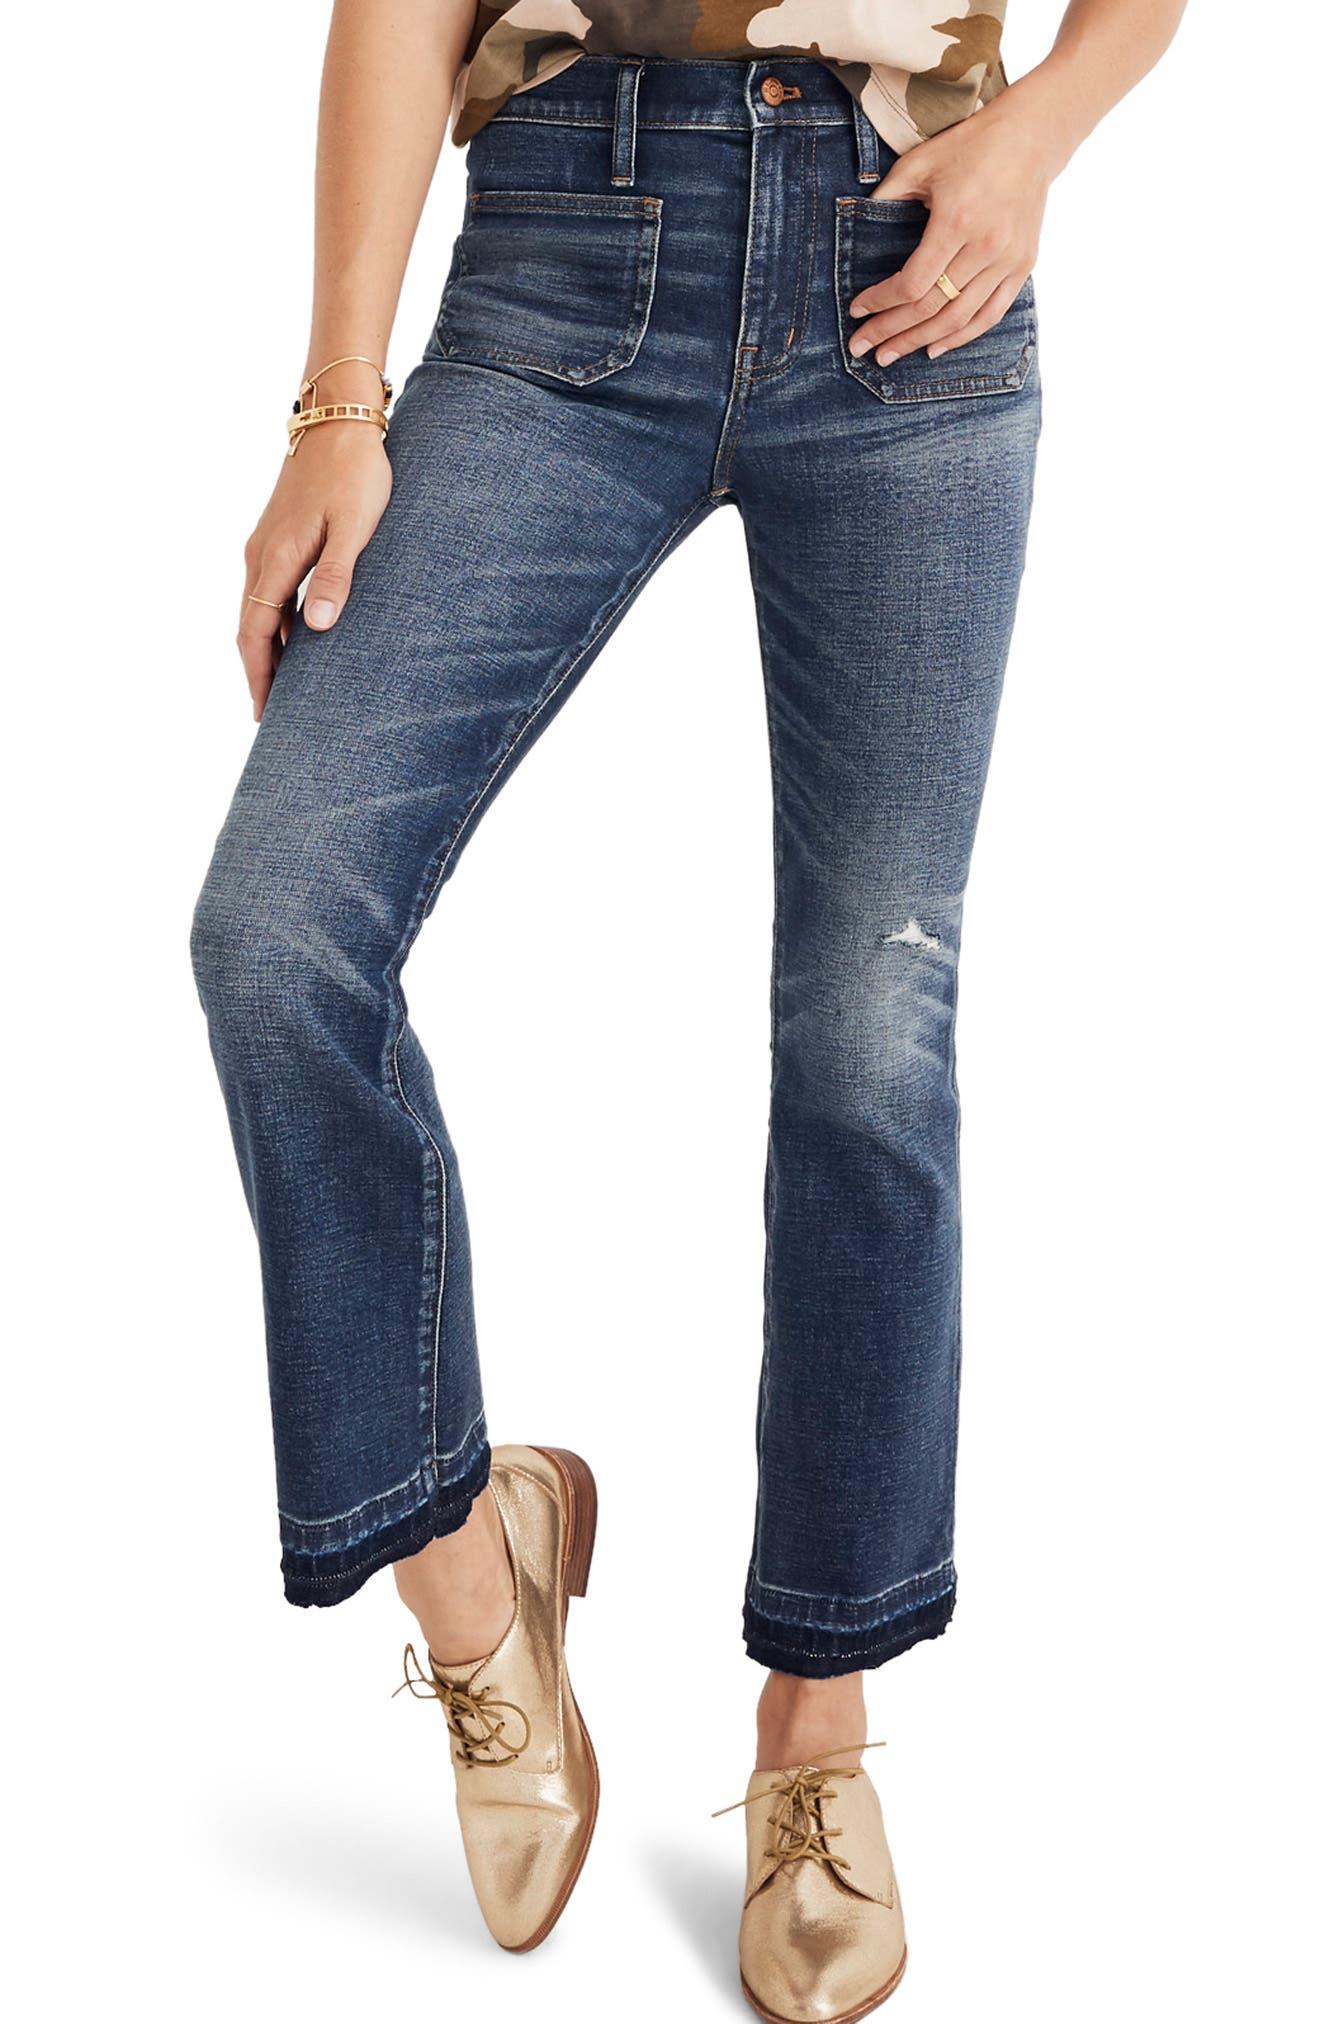 Cali Patch Pocket High Waist Demi Boot Jeans,                             Main thumbnail 1, color,                             DERMOTT